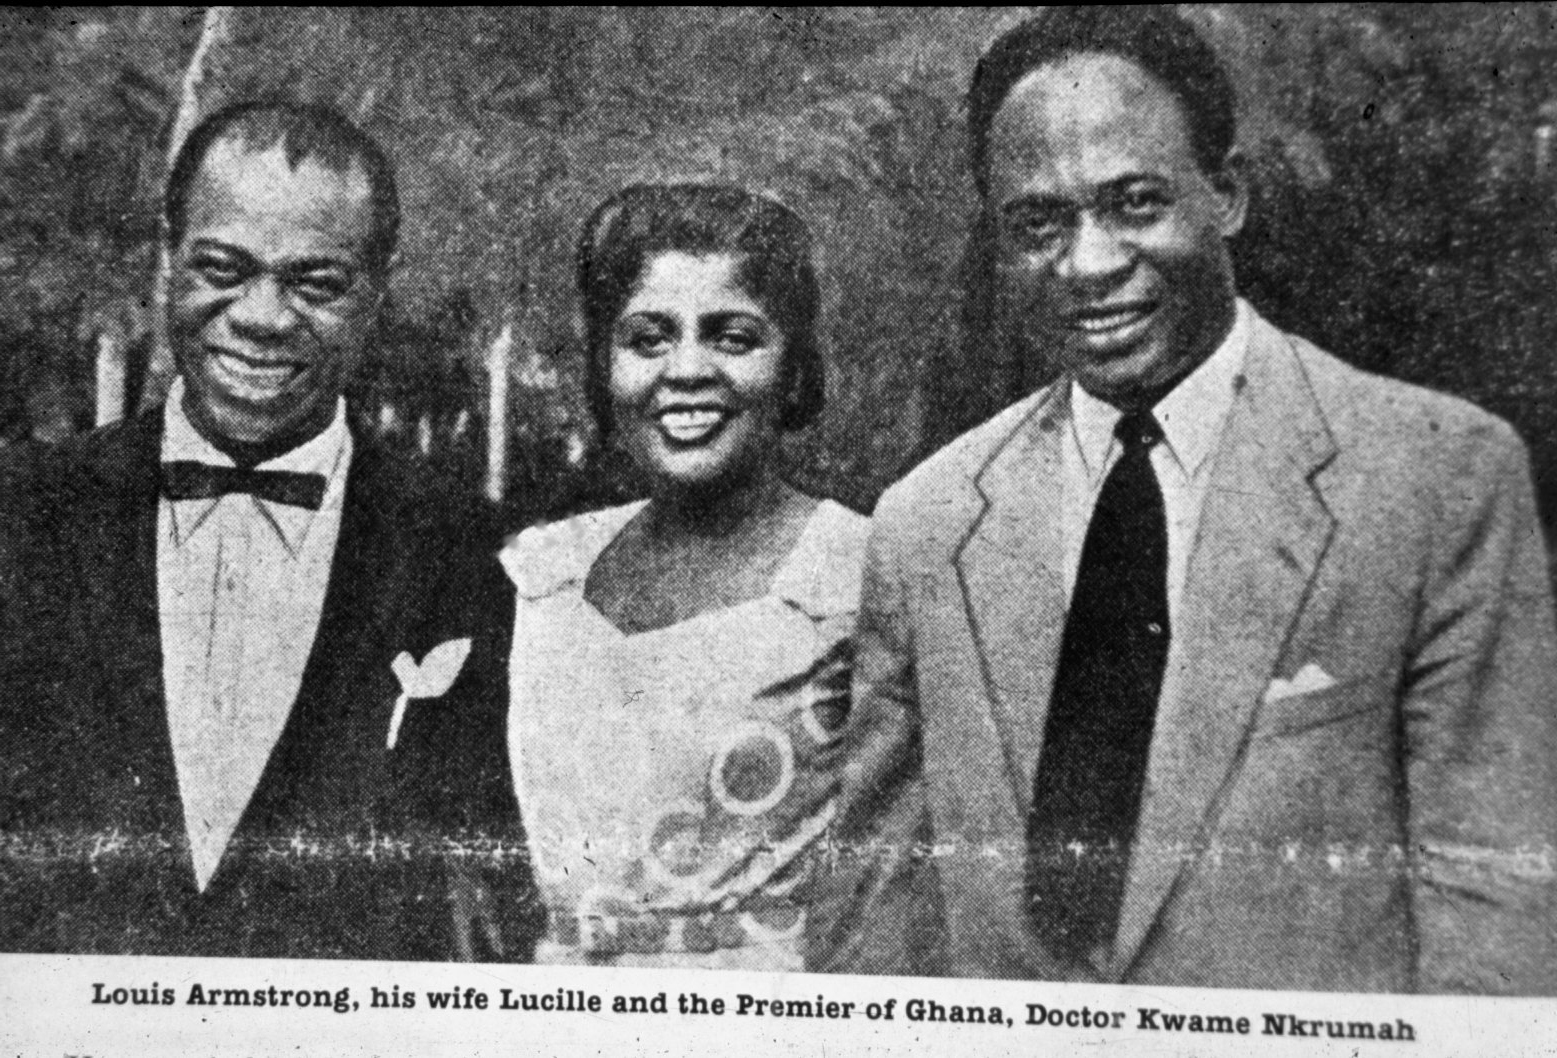 Nkrumah and Armstrong, 1956